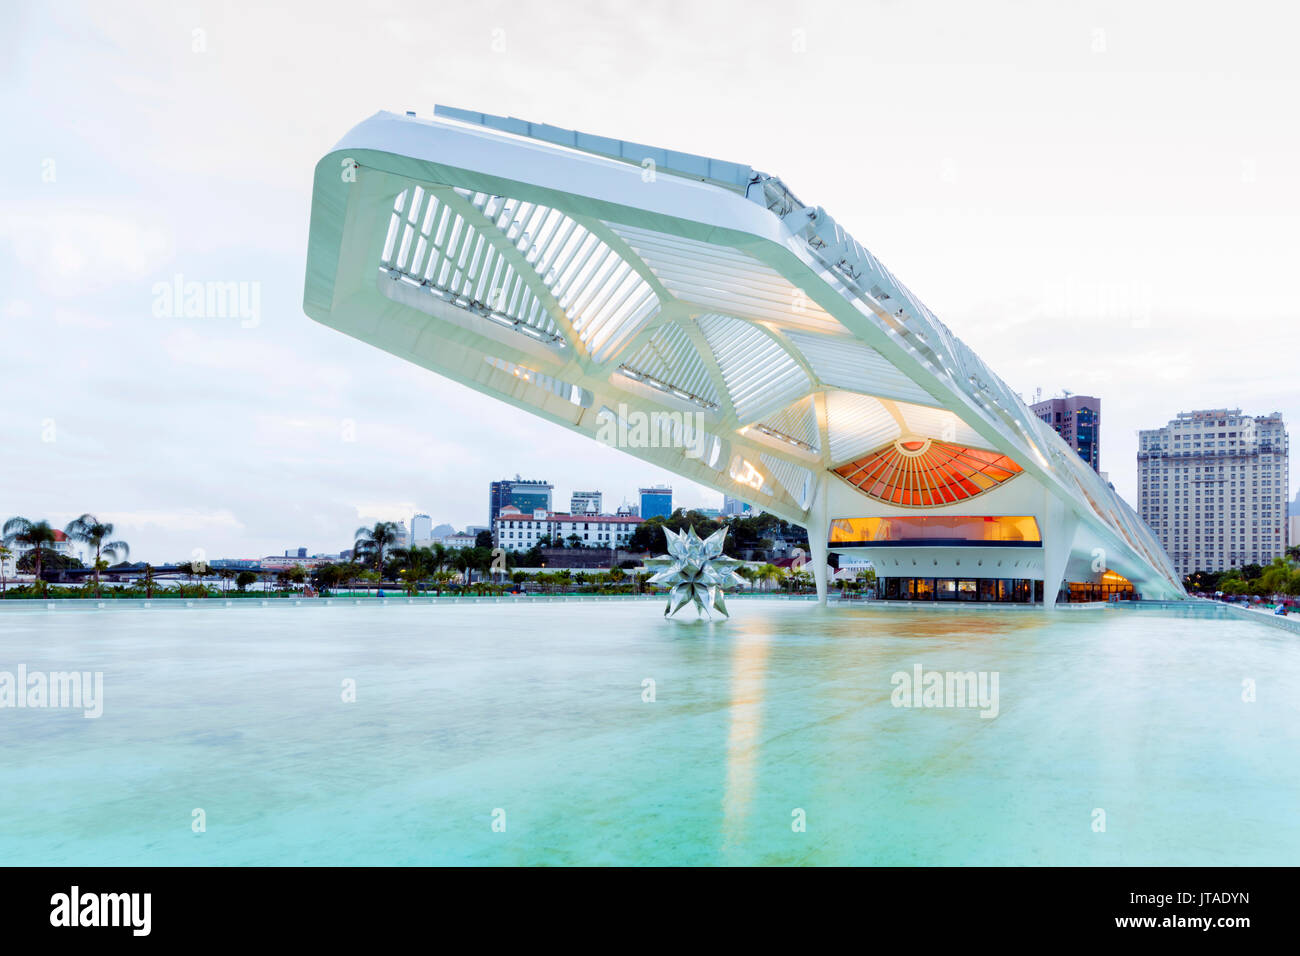 Museum of Tomorrow, an environmental museum in the city centre, architect Santiago Calatrava, Rio de Janeiro, Brazil - Stock Image